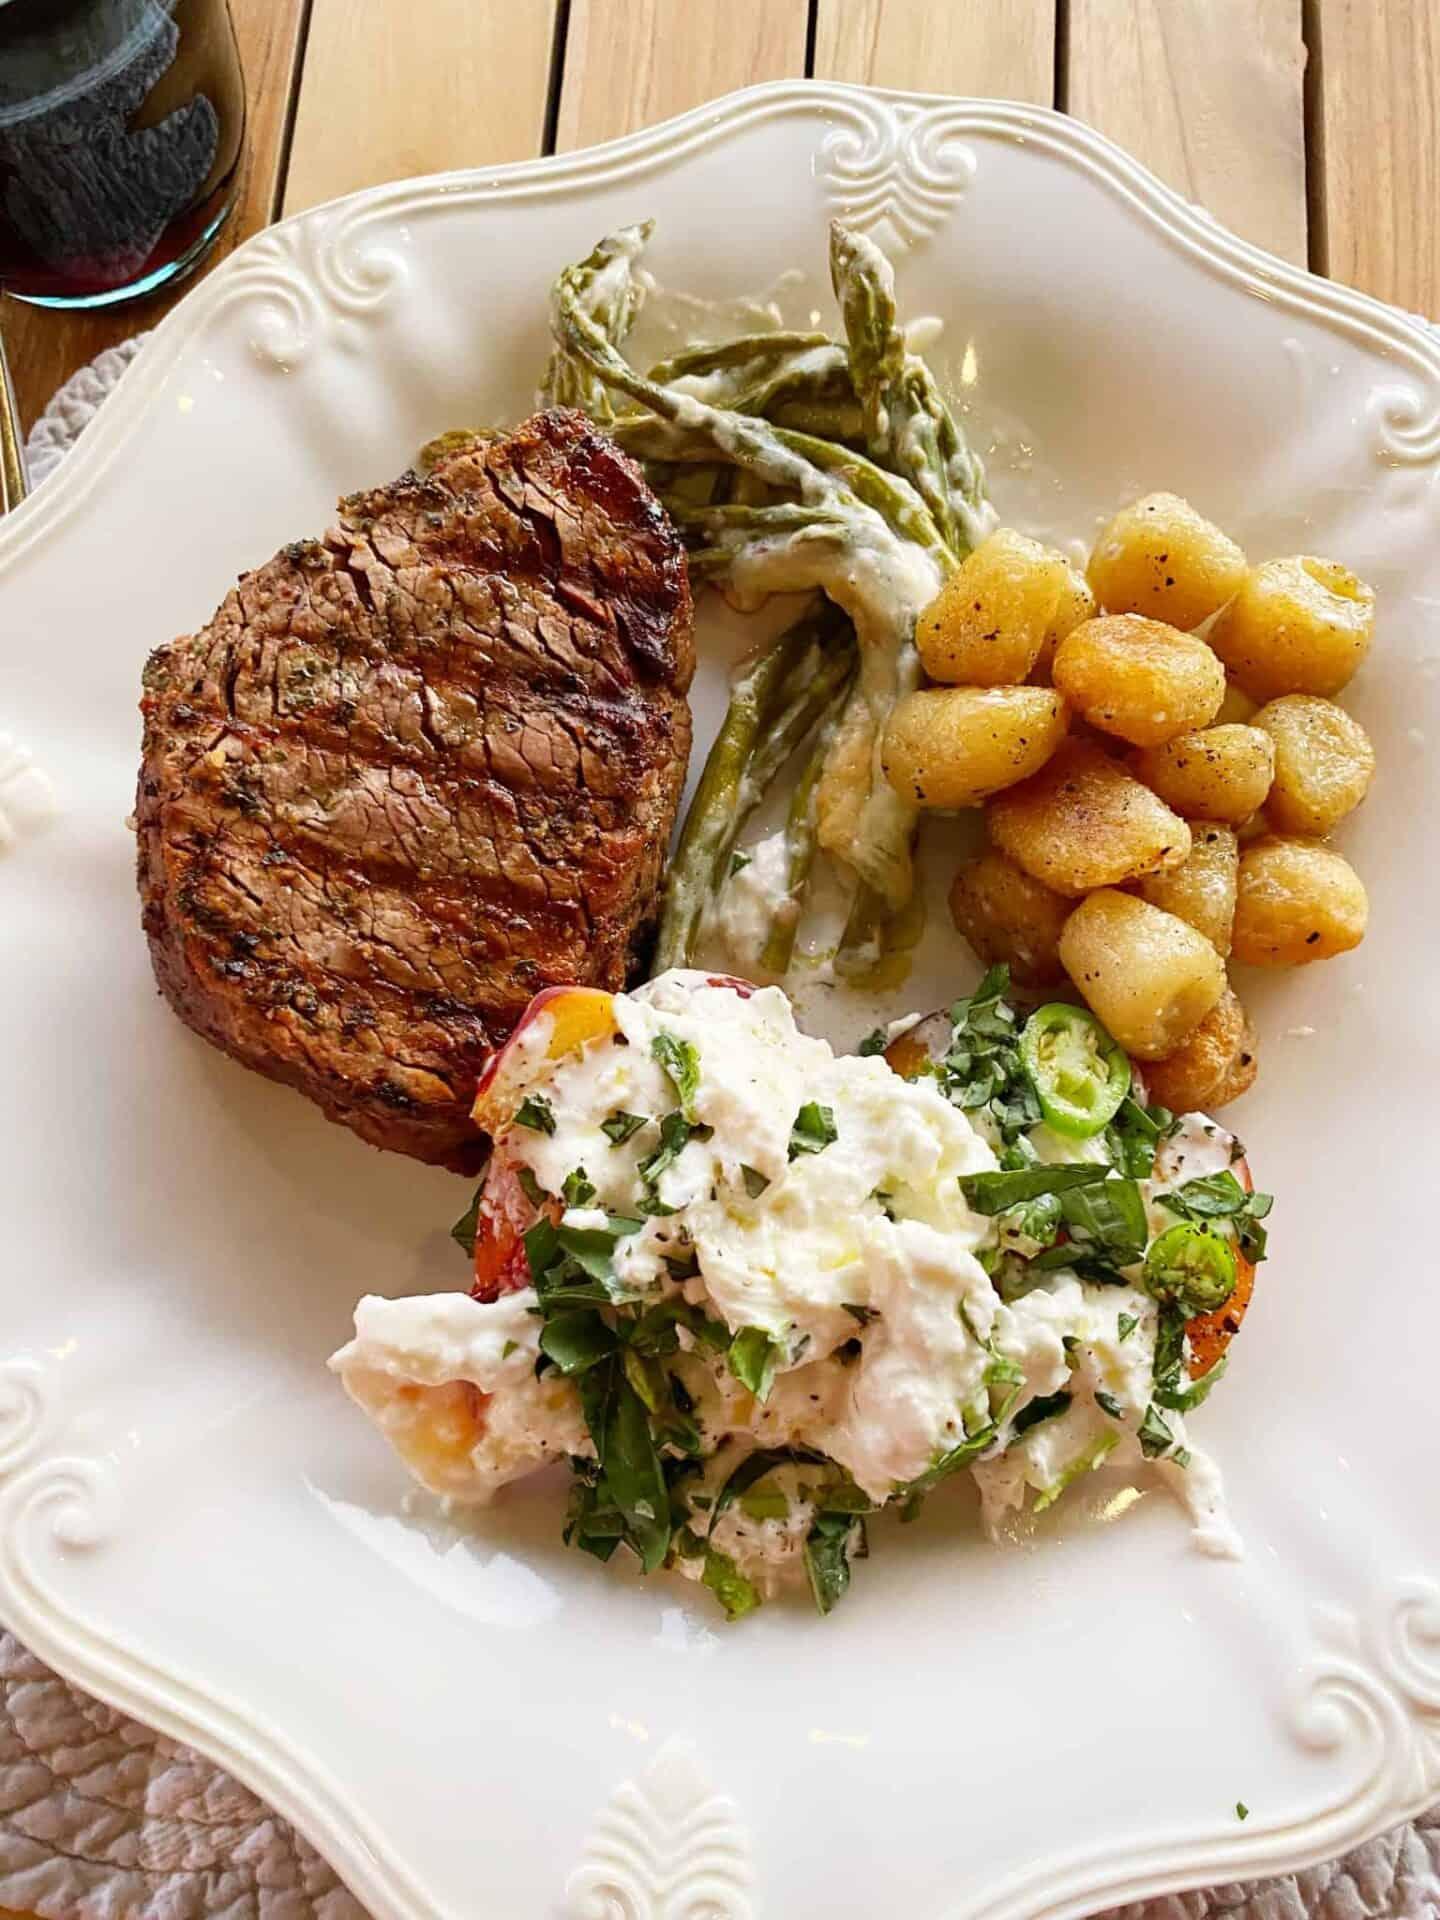 Filet-Mignon-Trader-Joes-Cauliflower-Gnocchi-and-Burrata-Salad-1